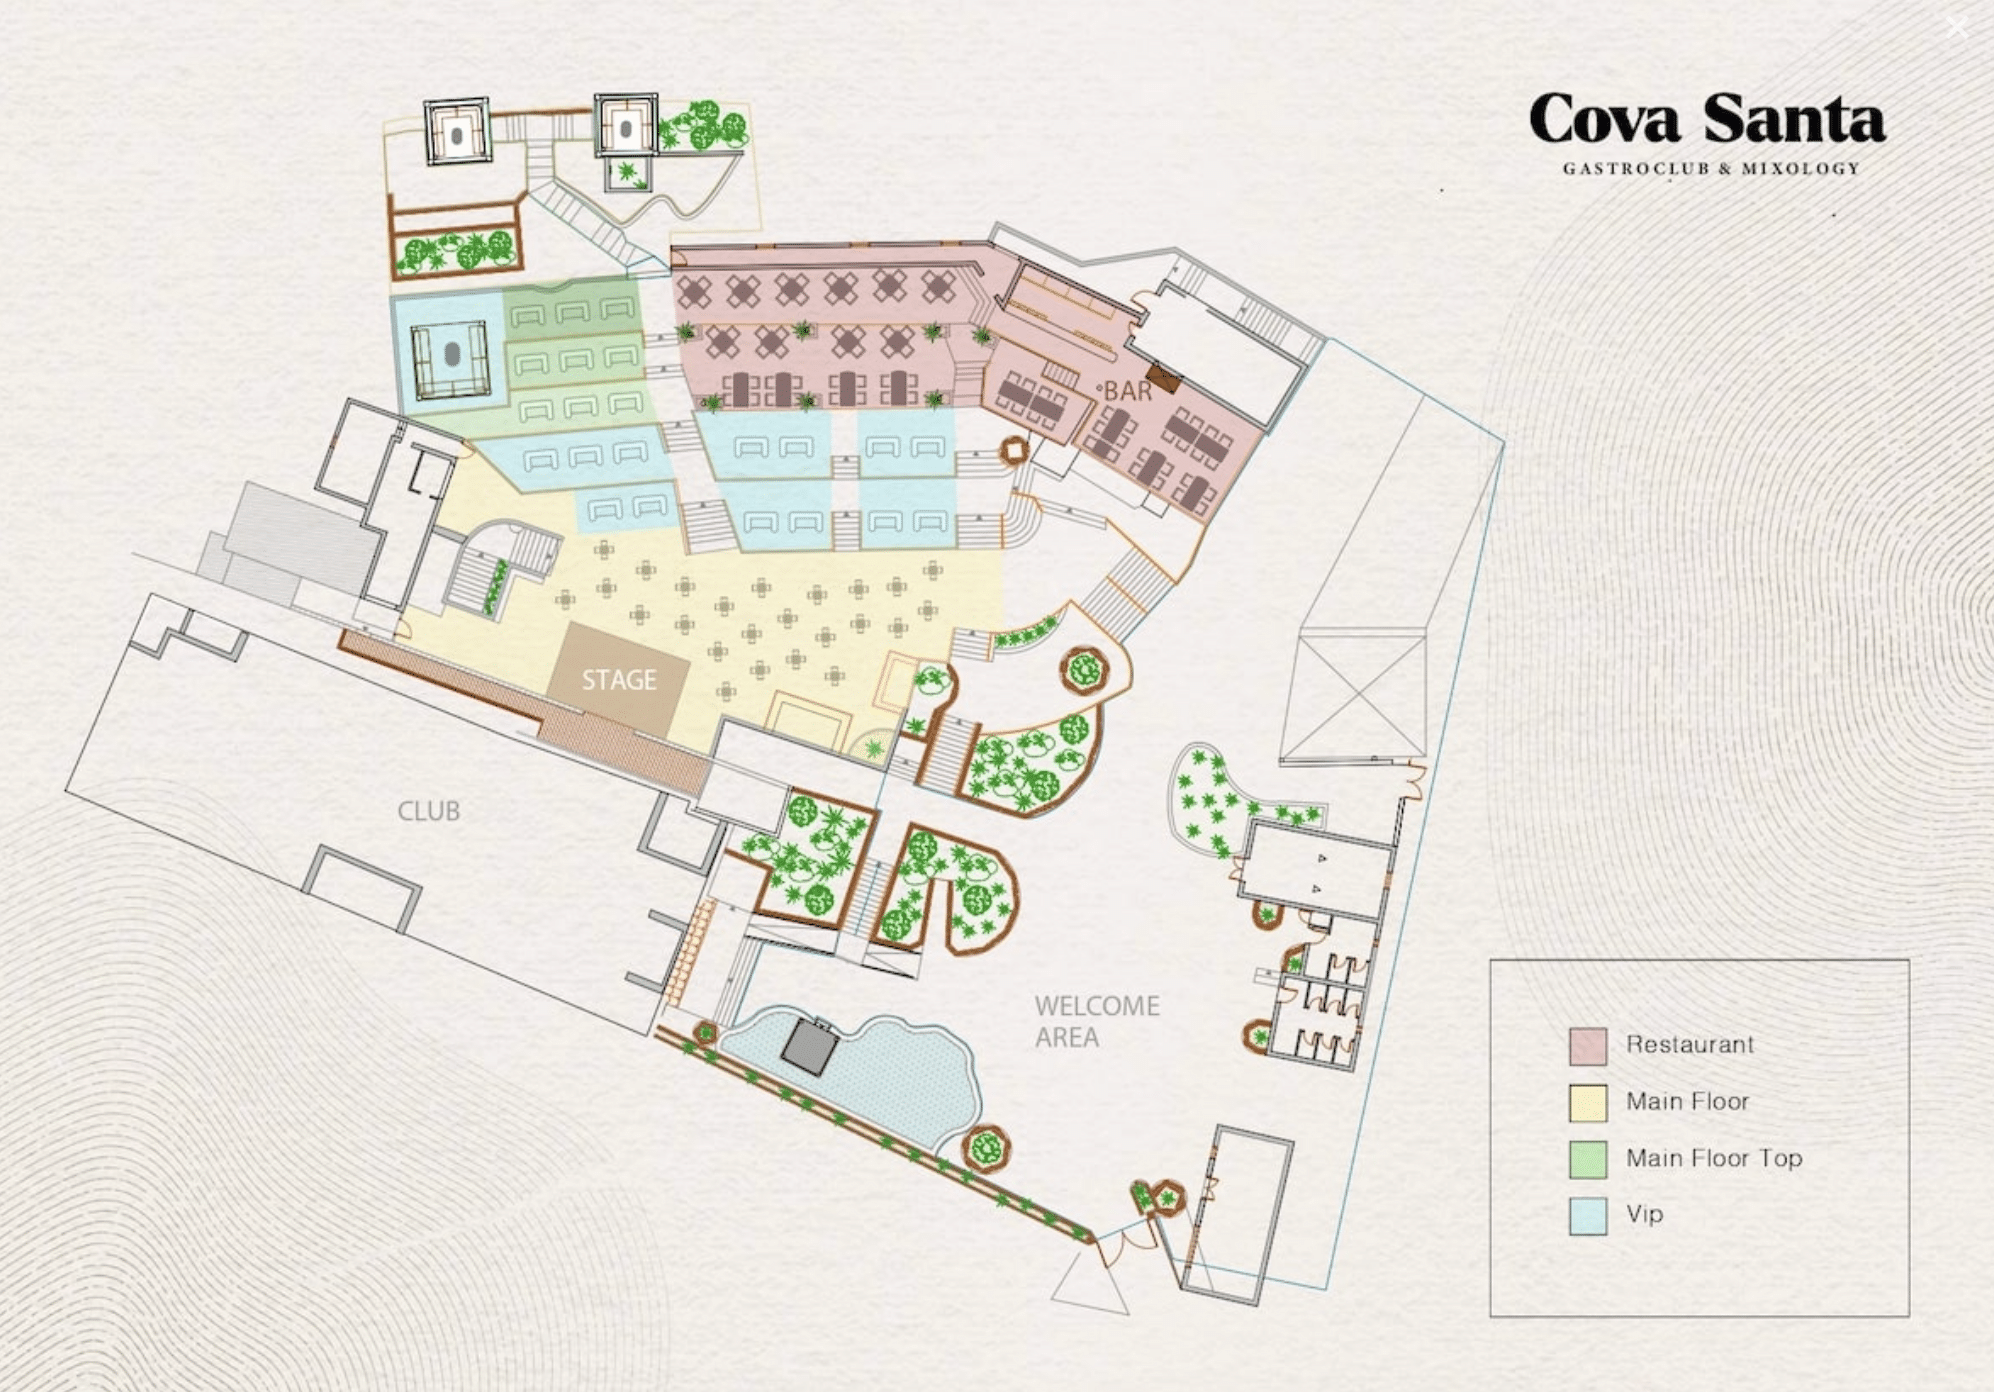 Cova Santa 2021 Seating Plan